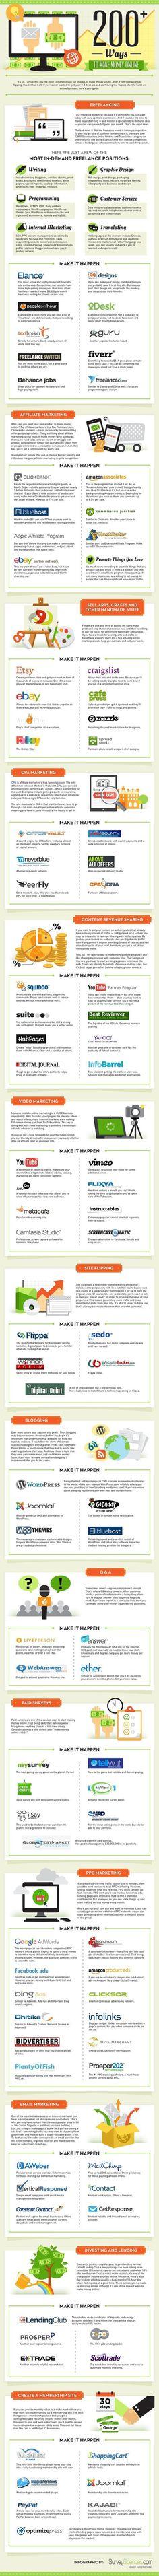 200+ Ways To Make Money Online [infographic]